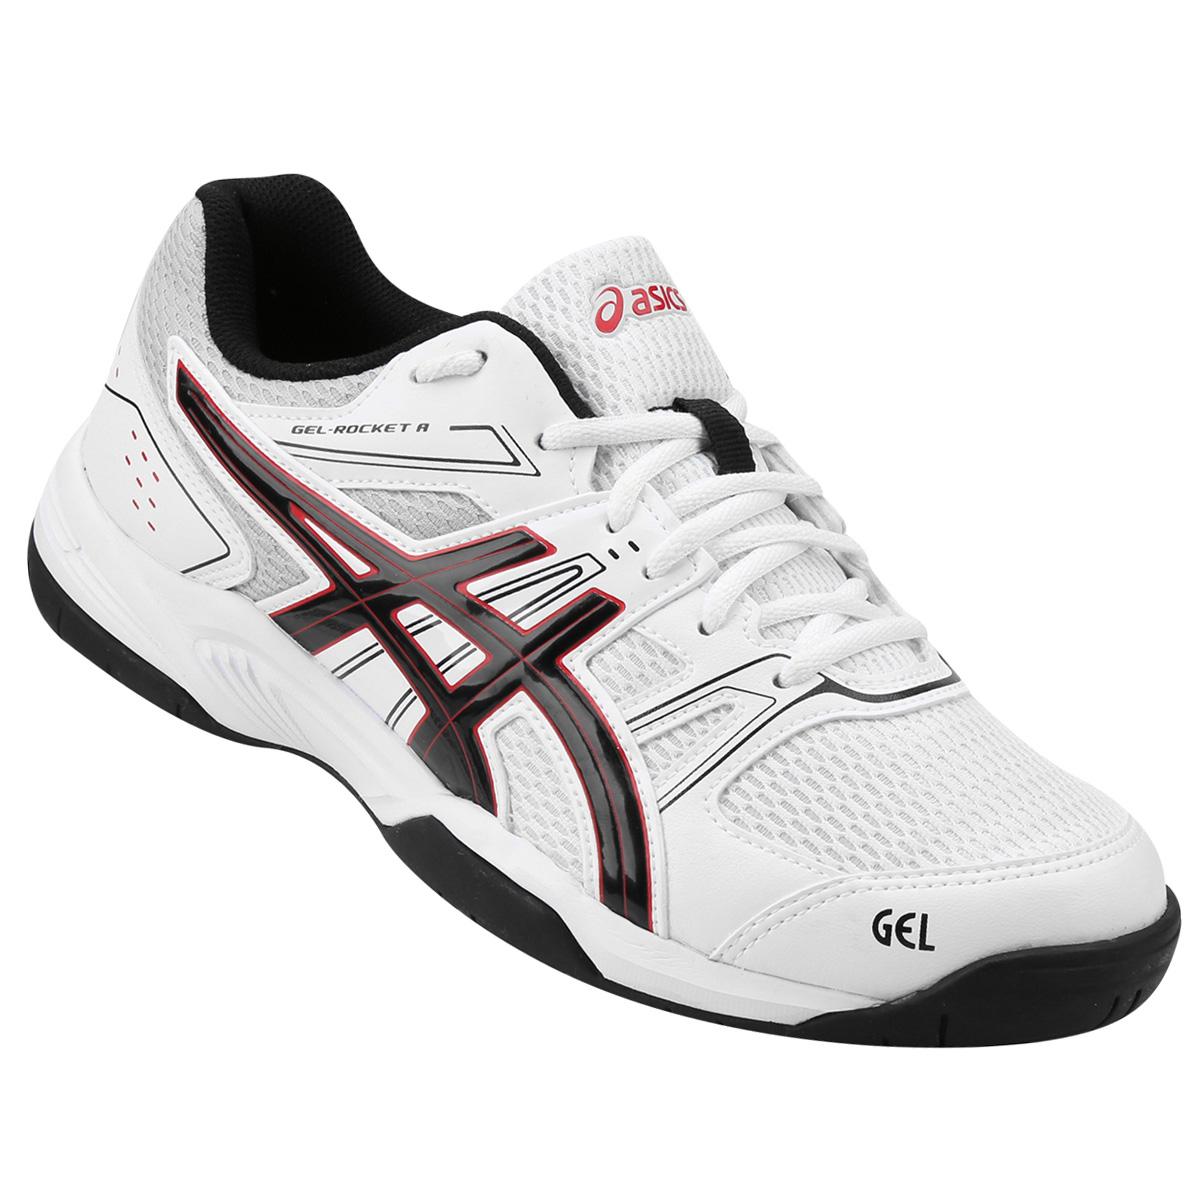 Tenis Asics Gel Rocket 7 A White/Black/True Red